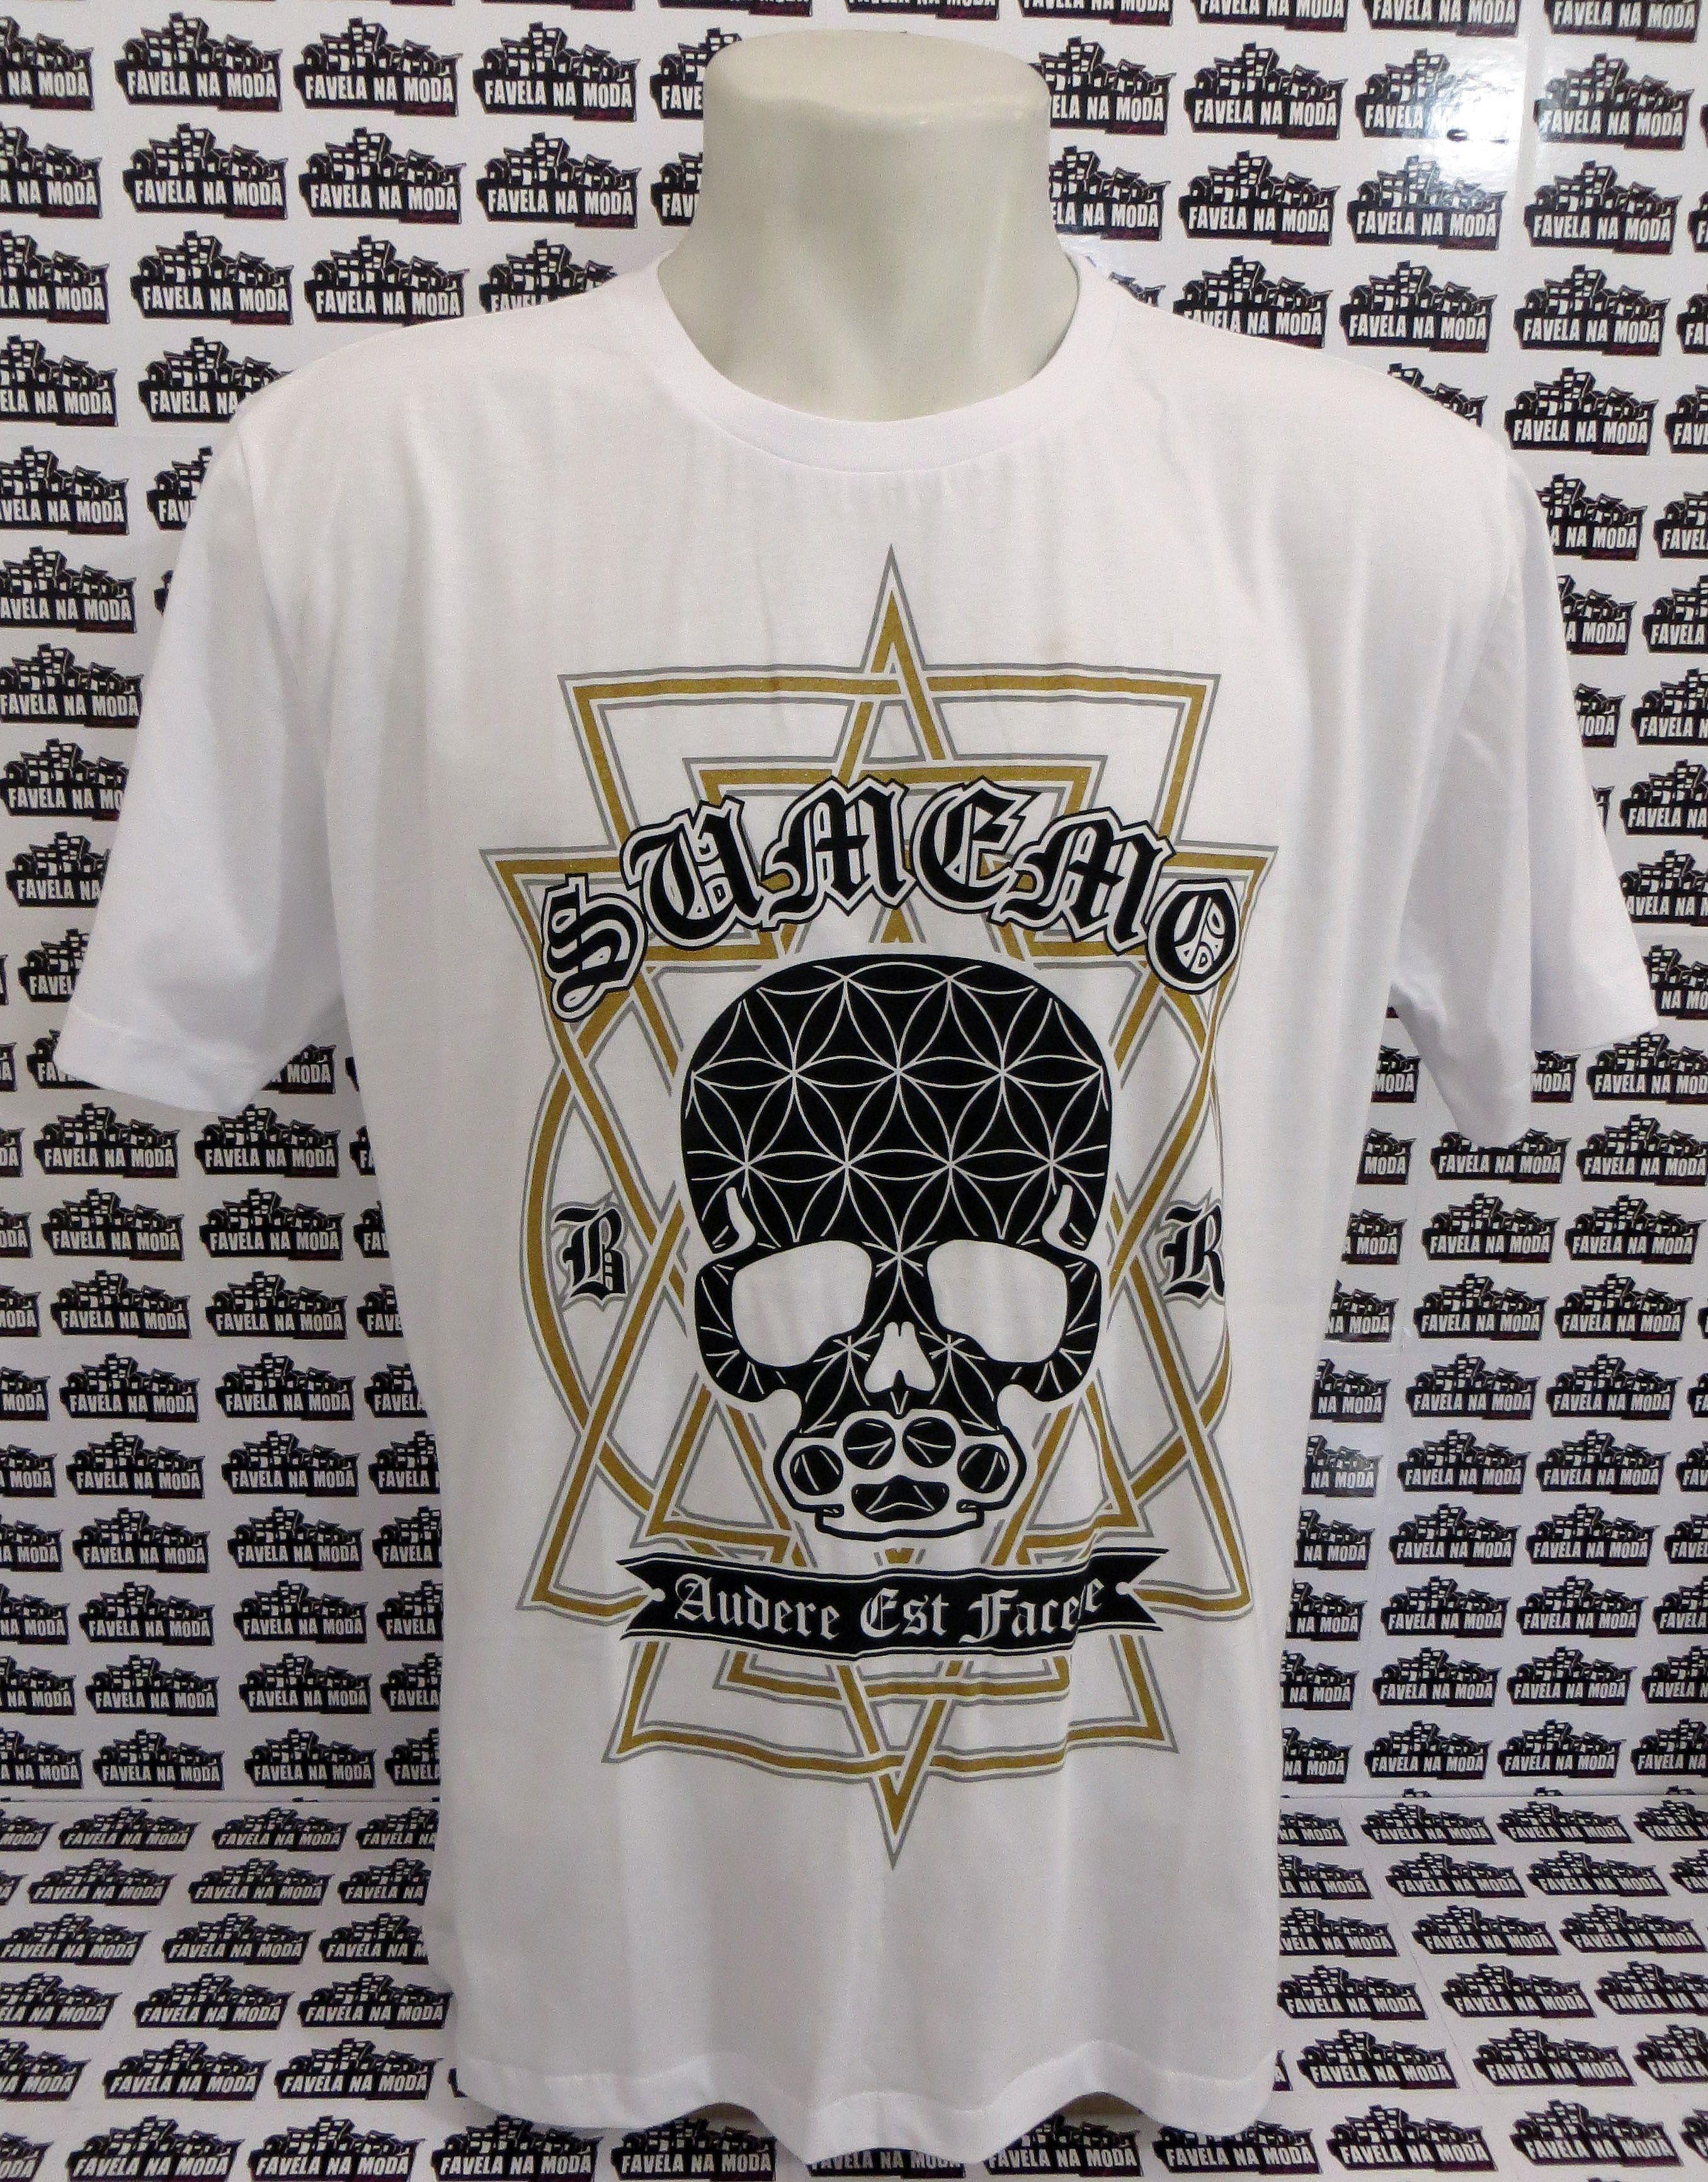 37341342df Camisetas - Favela na Moda Imports